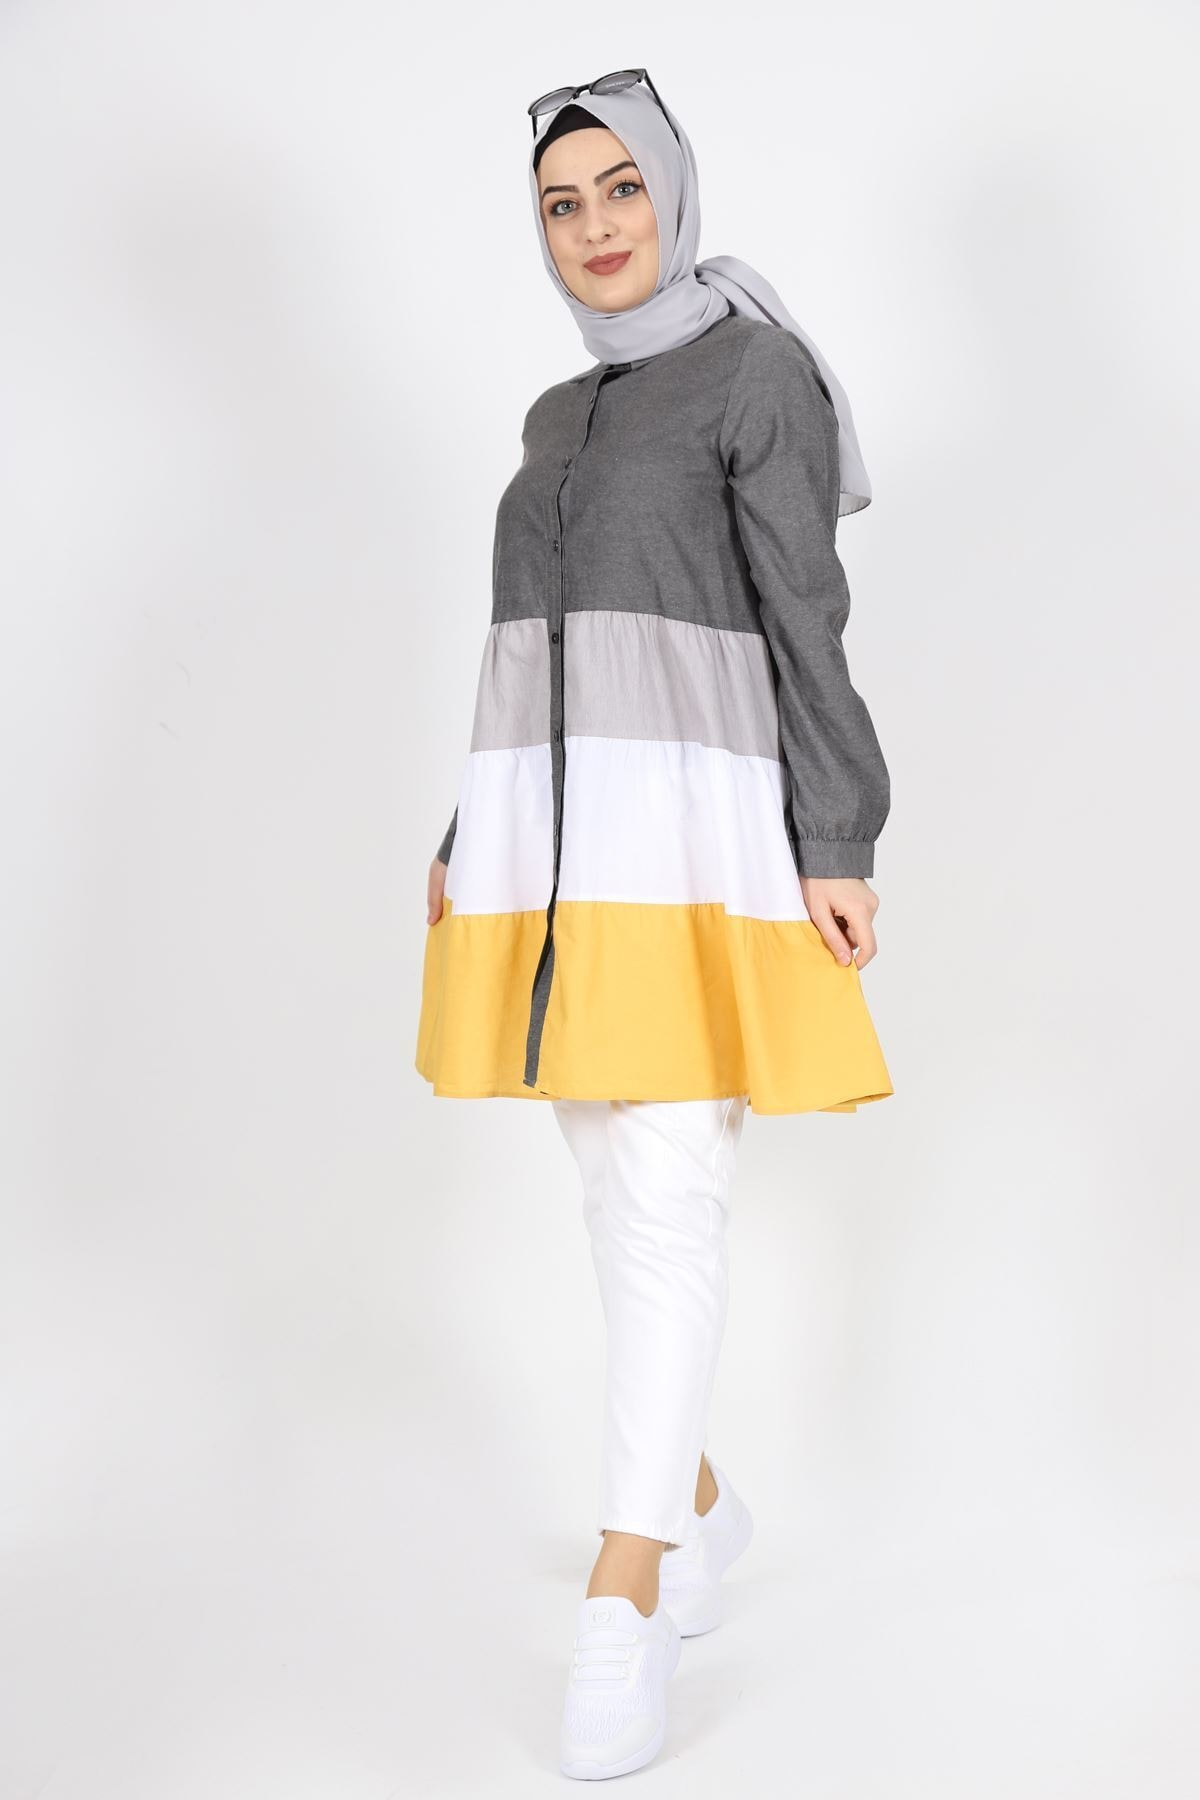 7101 Cotton Kumaş Bayan Gömlek Tunik - Füme